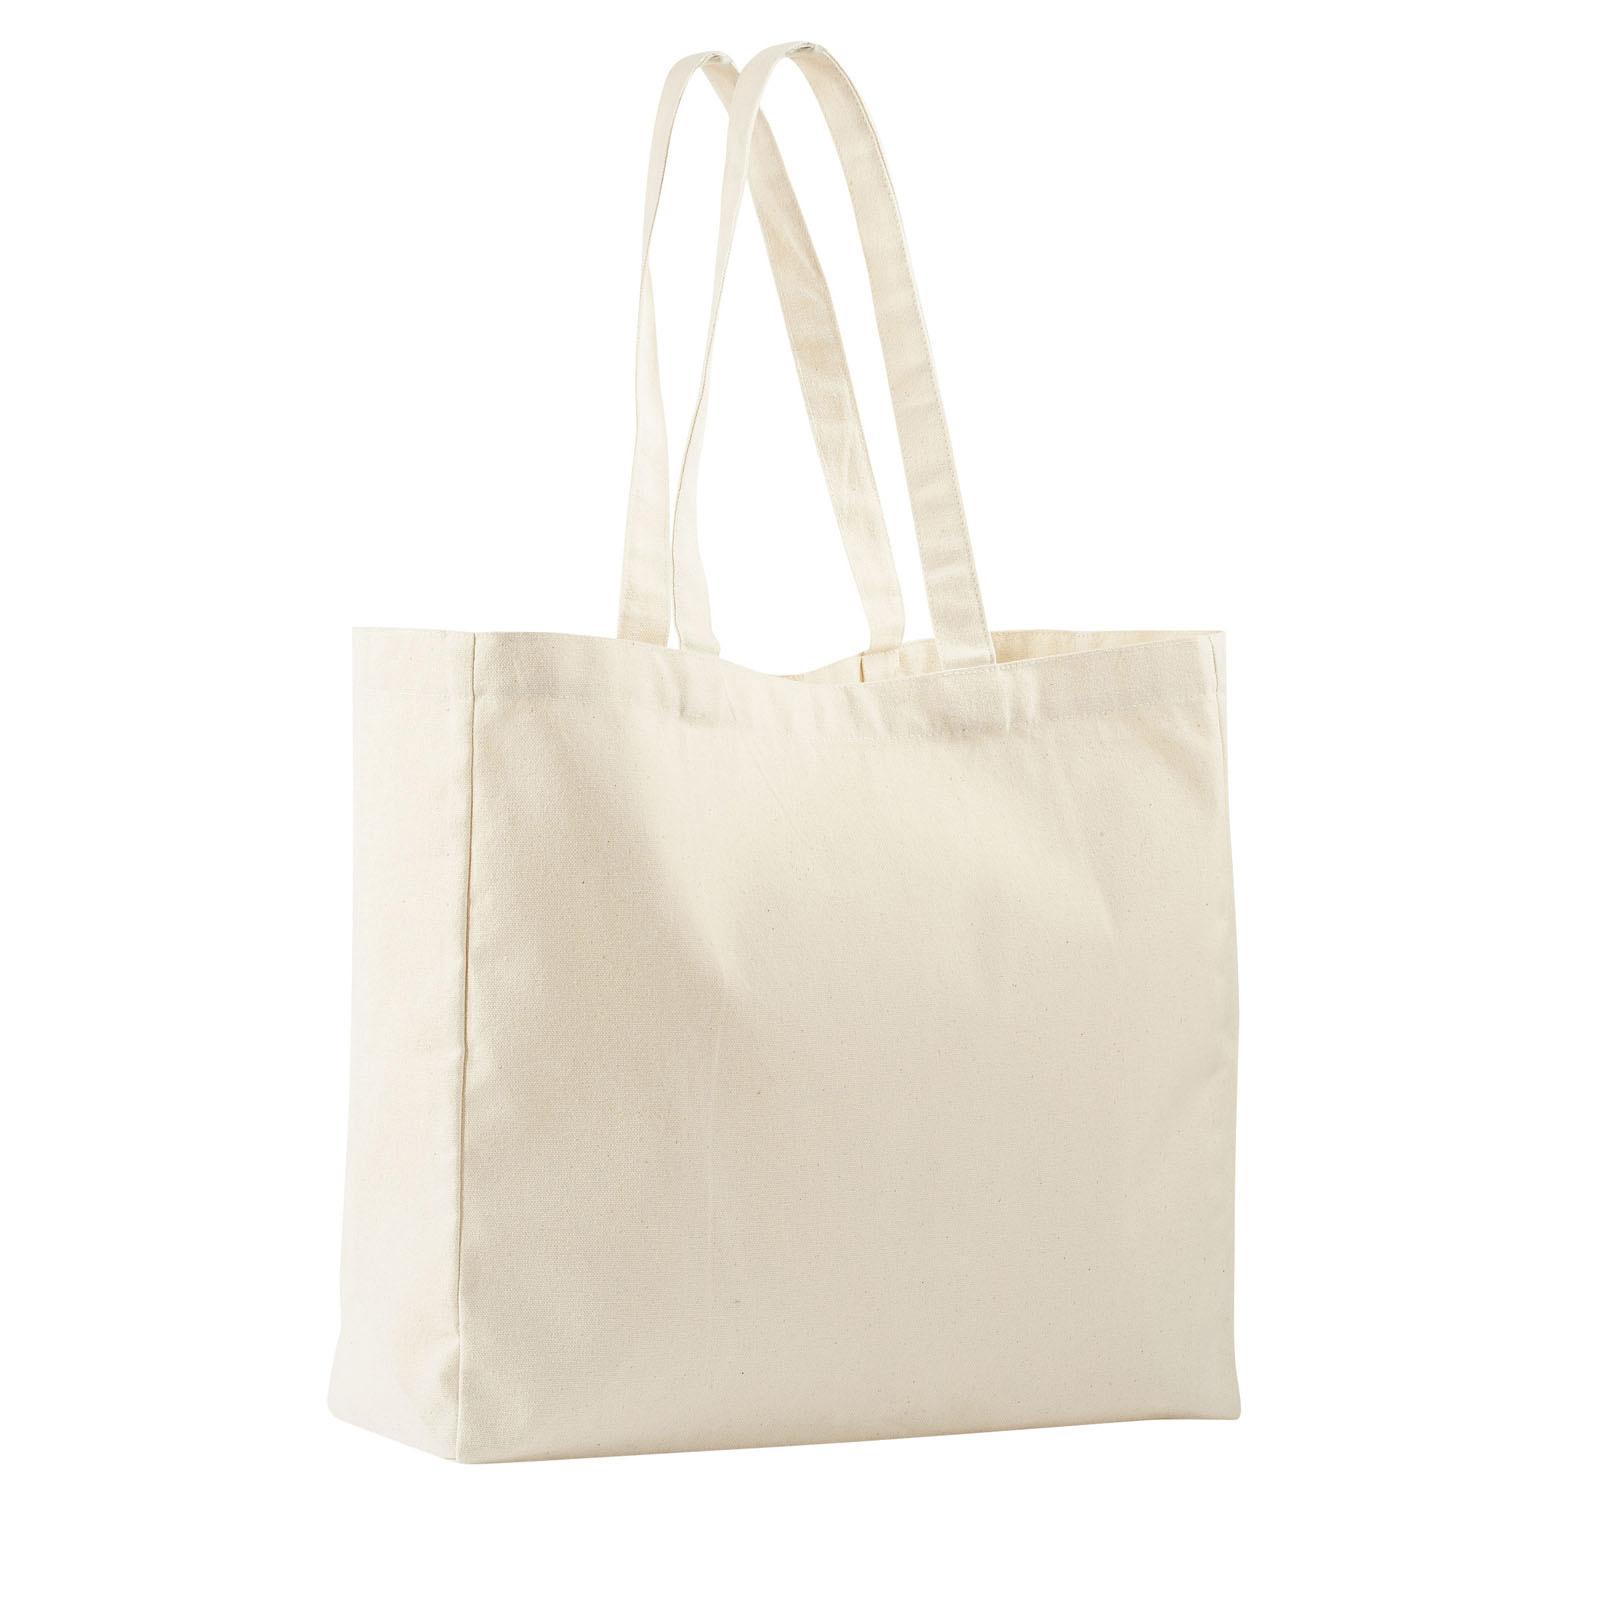 sac shopping pliable en coton naturel delsec20 le. Black Bedroom Furniture Sets. Home Design Ideas